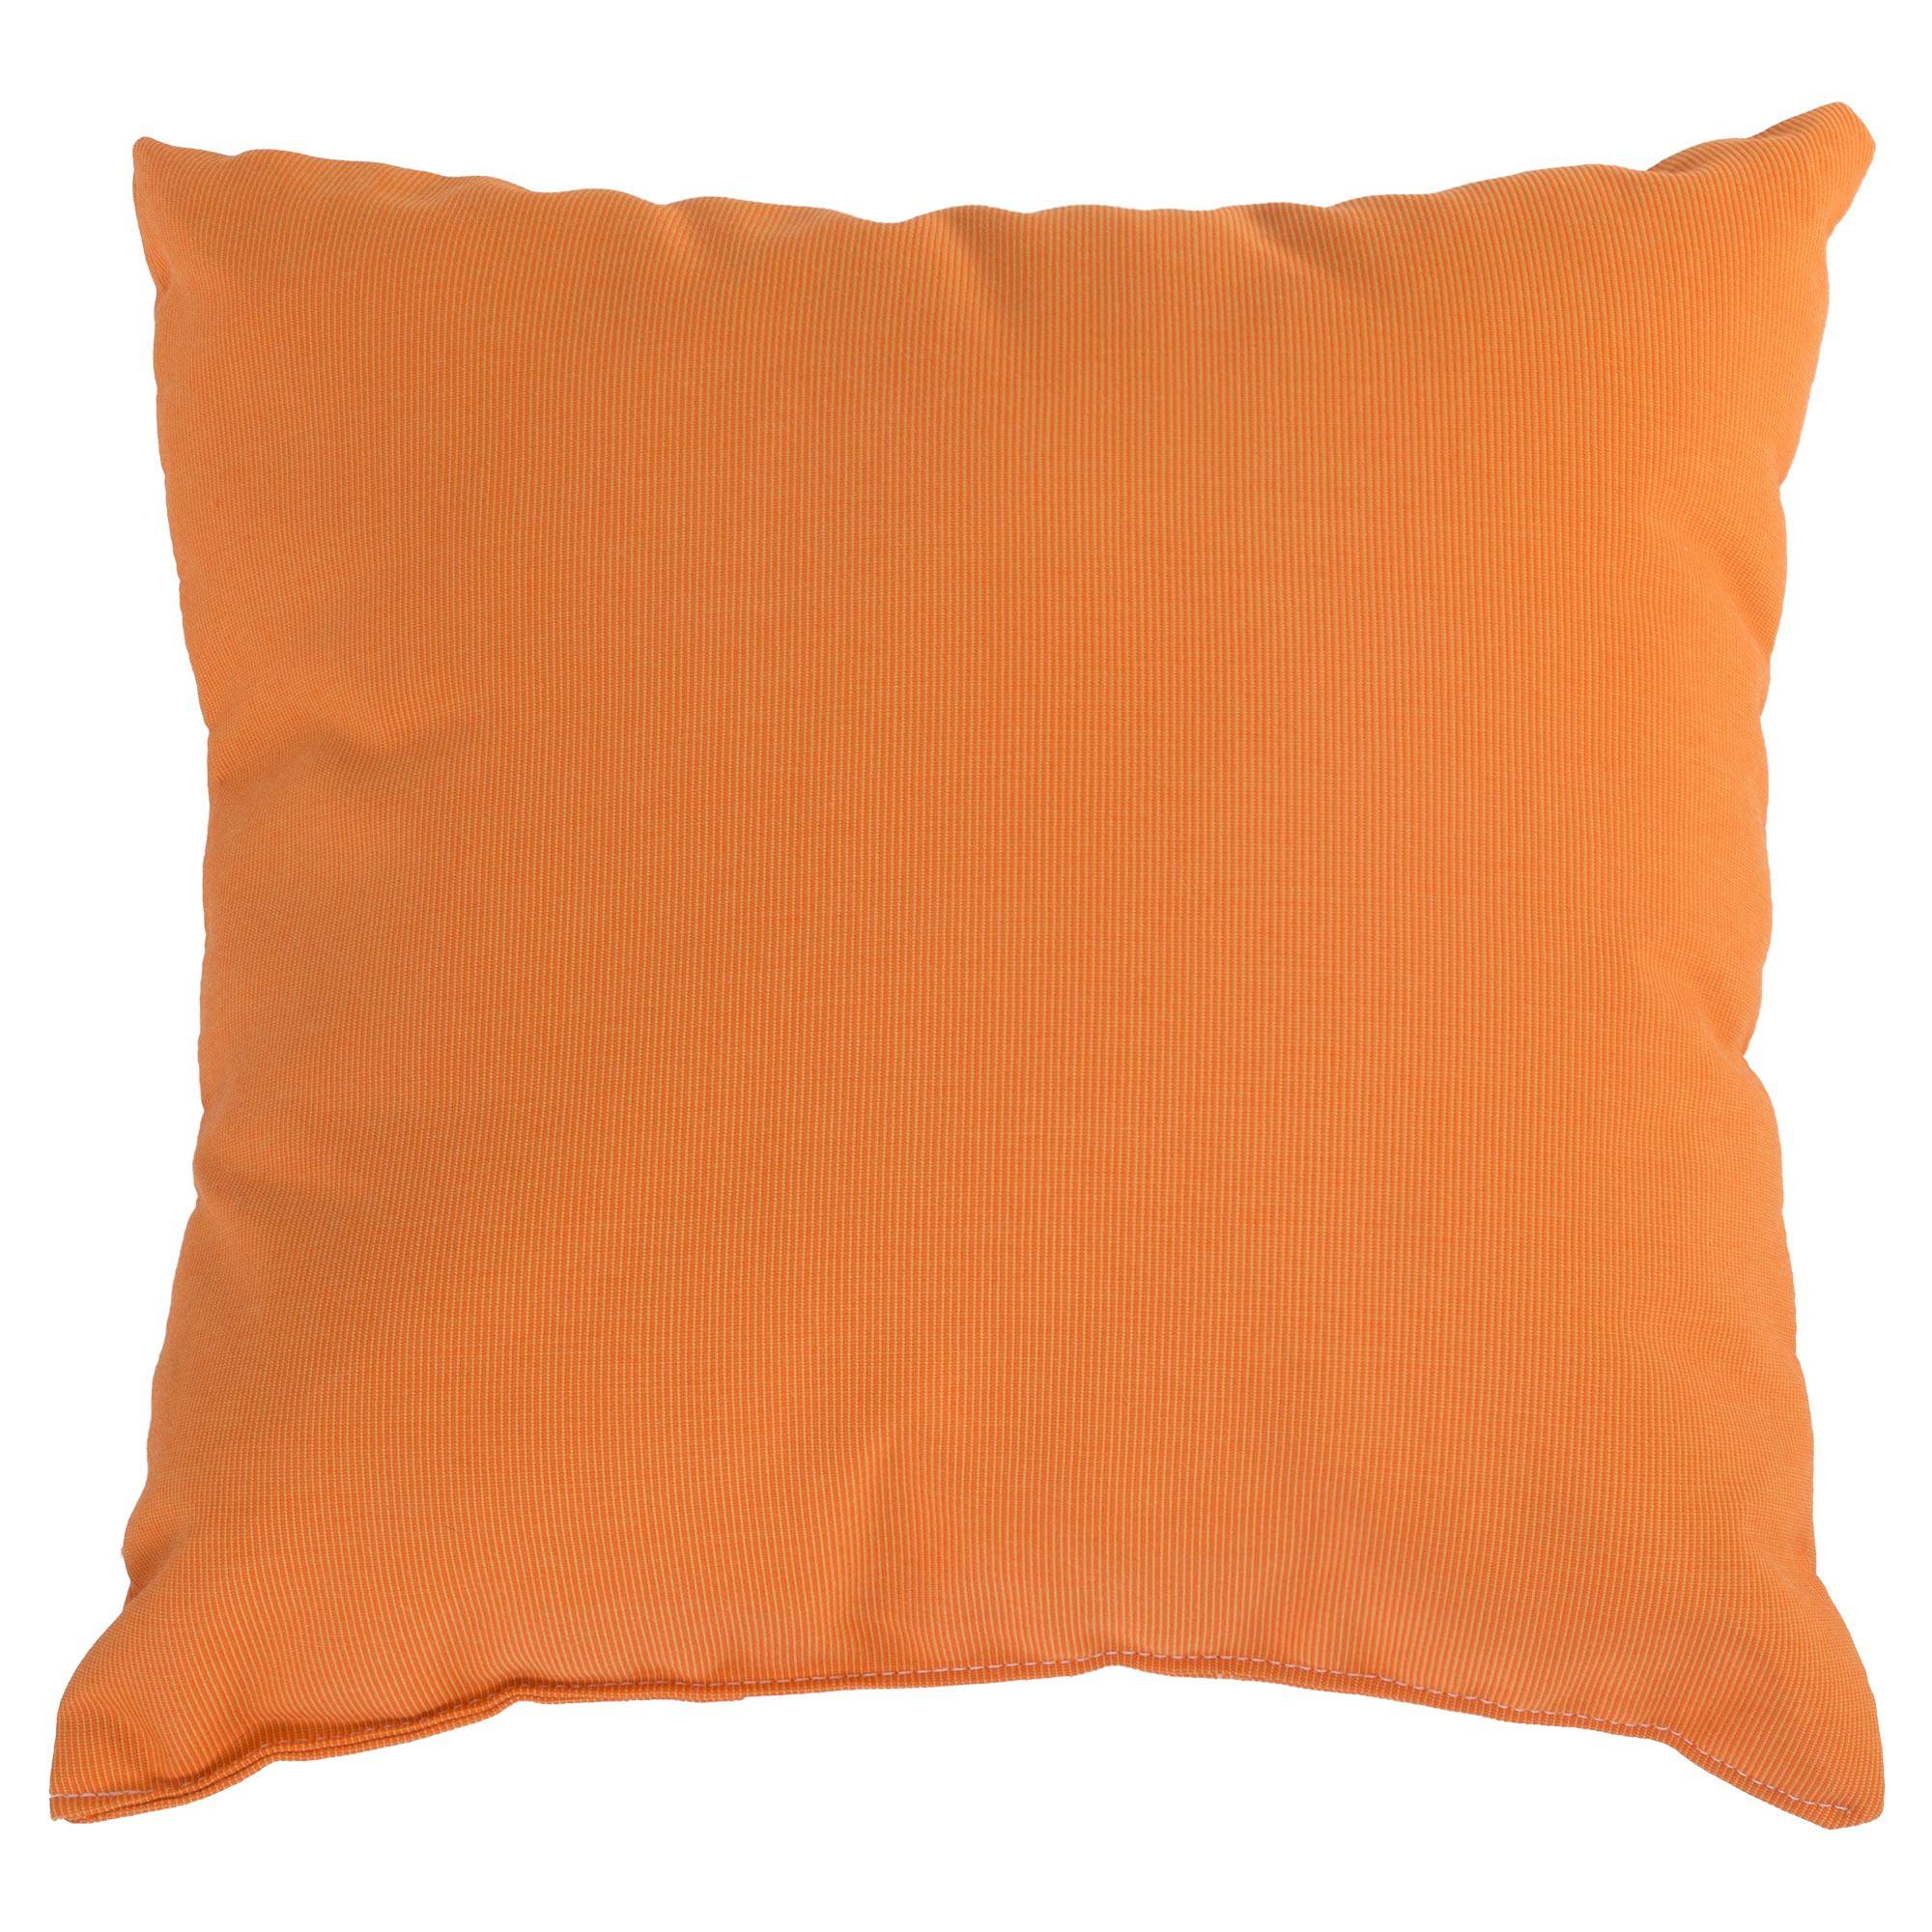 Tangerine Sunbrella Outdoor Throw Pillow